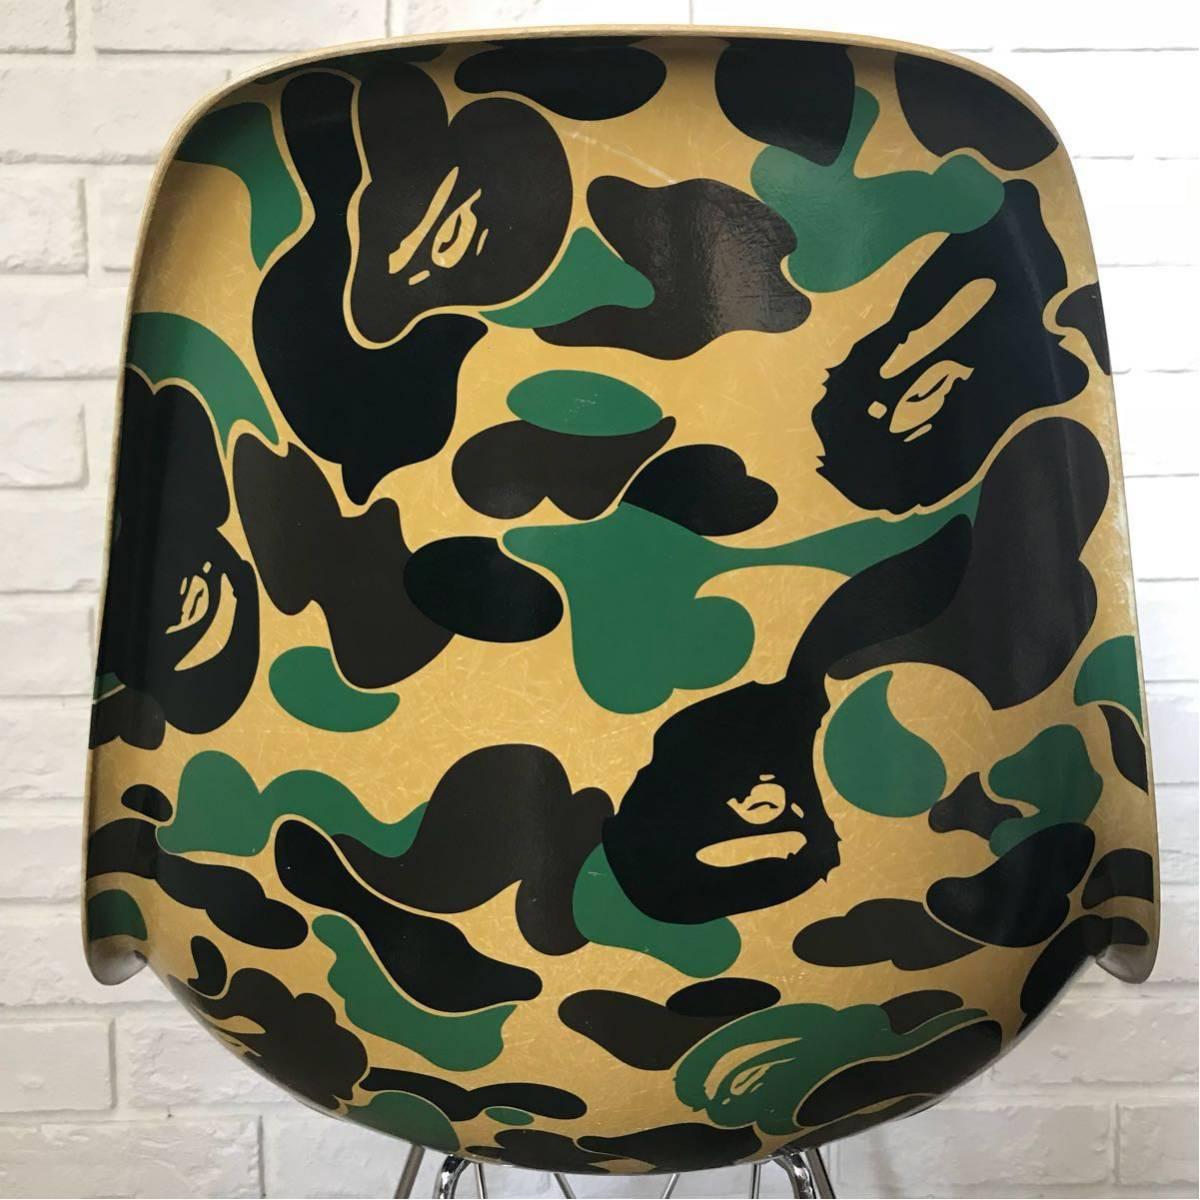 MODERNICA × BAPE CAMO SIDE CHAIR green a bathing ape EAMES モダニカ イームズ チェア ABC CAMO ABCカモ エイプ ベイプ 椅子 カリモク